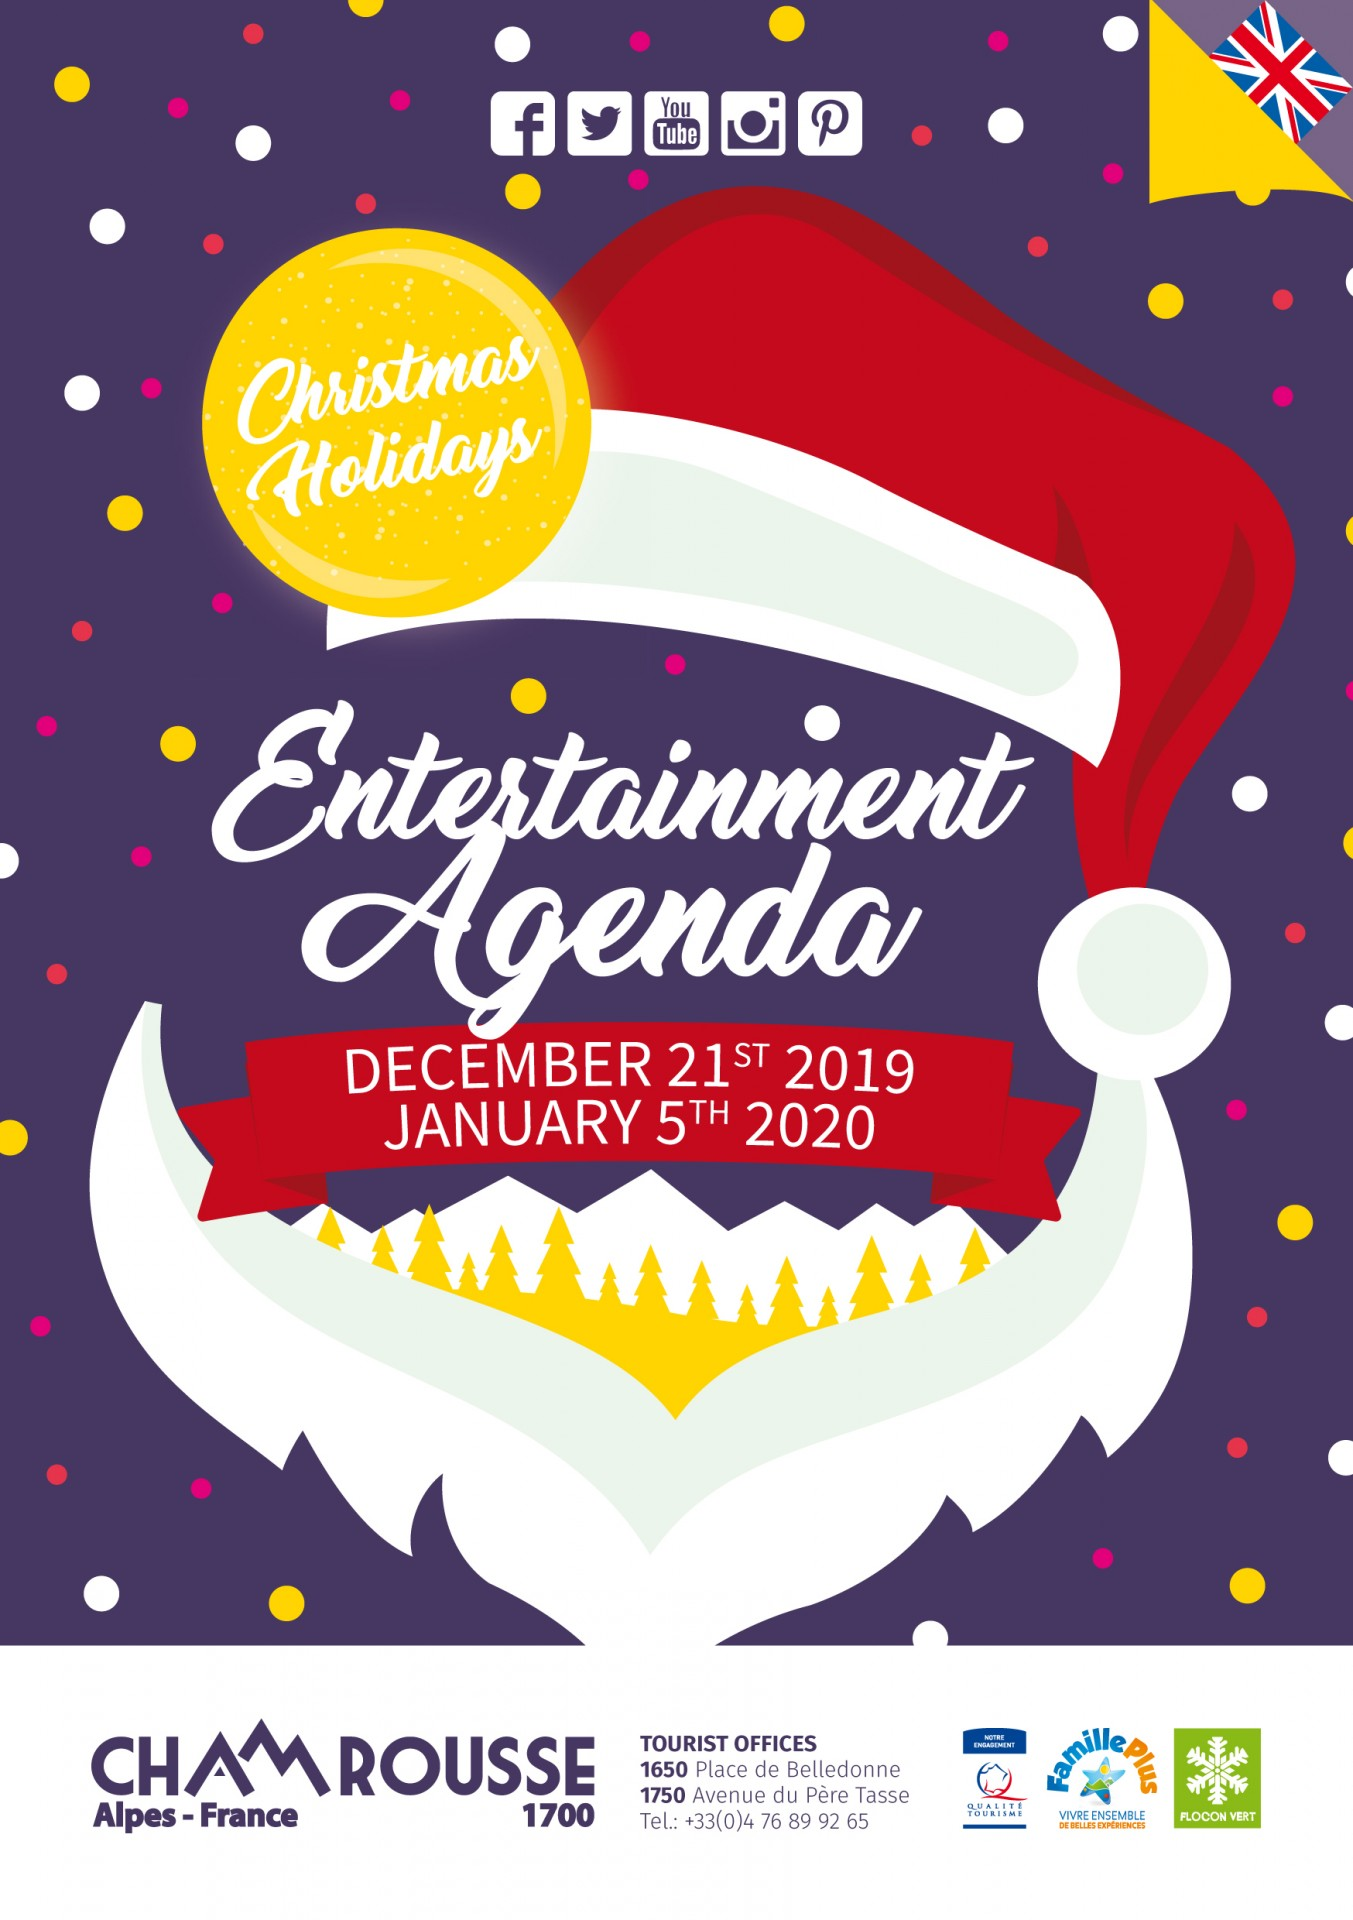 chamrousse-entertainment-programme-cover-winter-christmas-holidays-2019-en-ski-resort-isere-french-alps